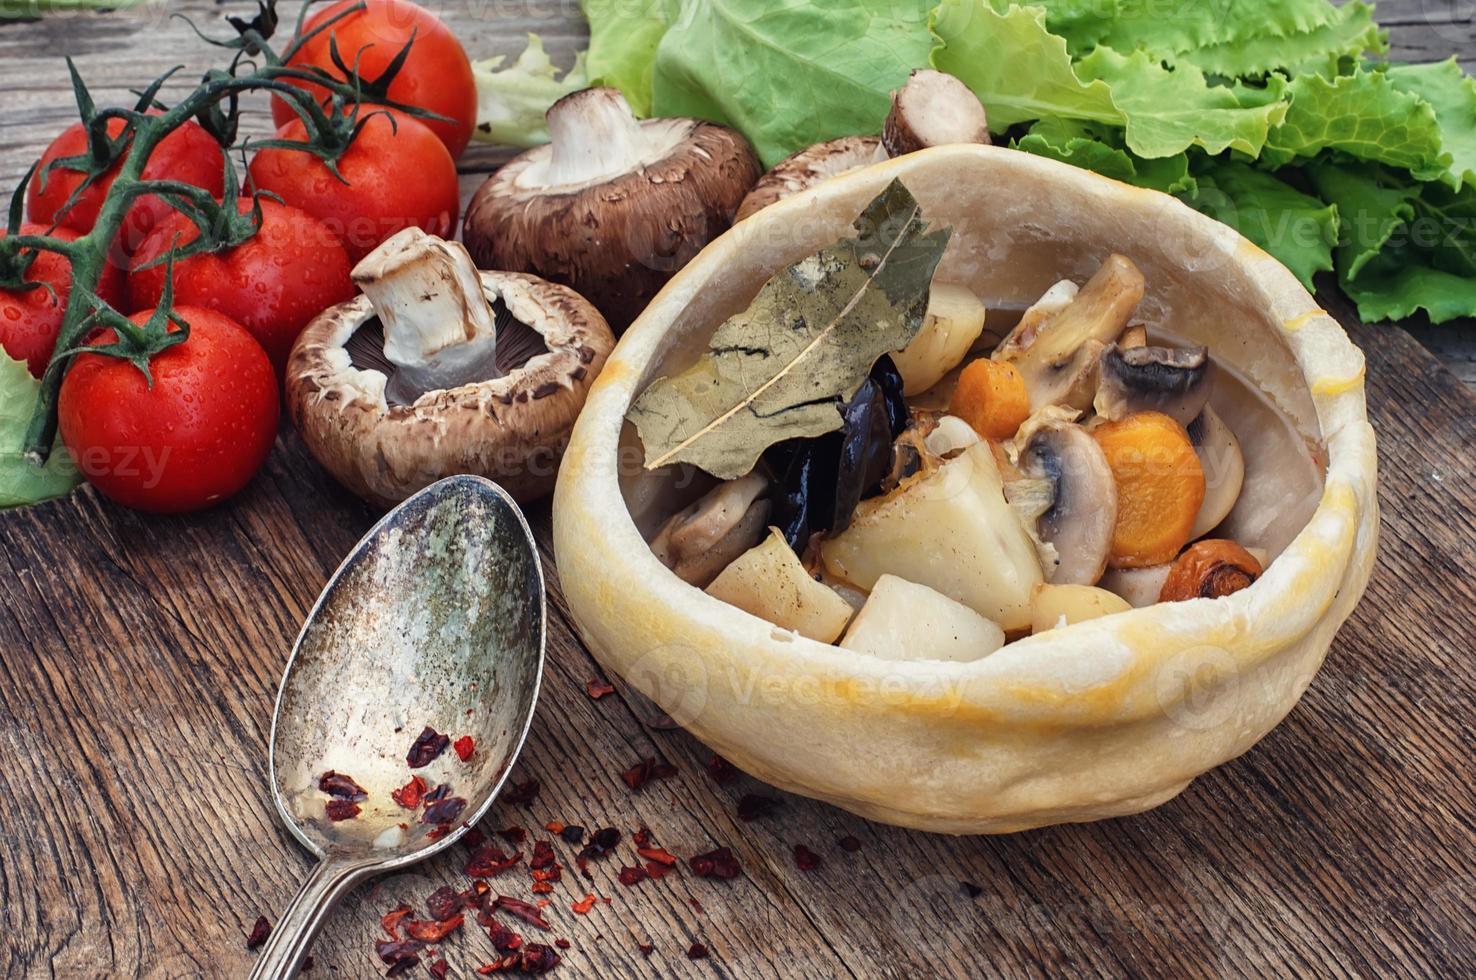 receta de vegetales salteados cocina tradicional ucraniana foto